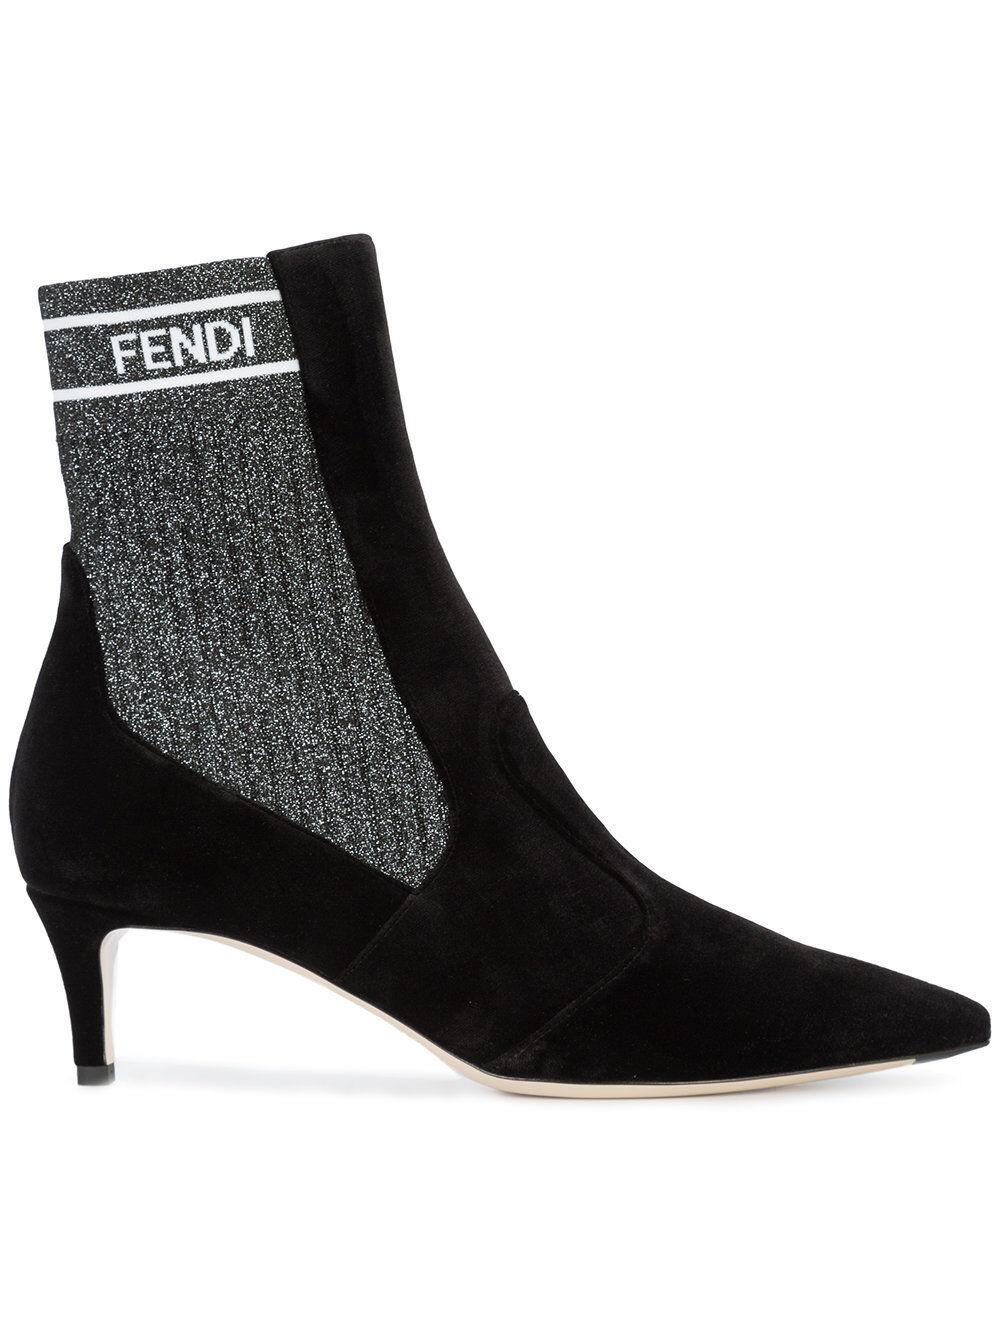 NIB NEW Fendi Rockoko women black velvet socks booties boots logo 37.5 38.5